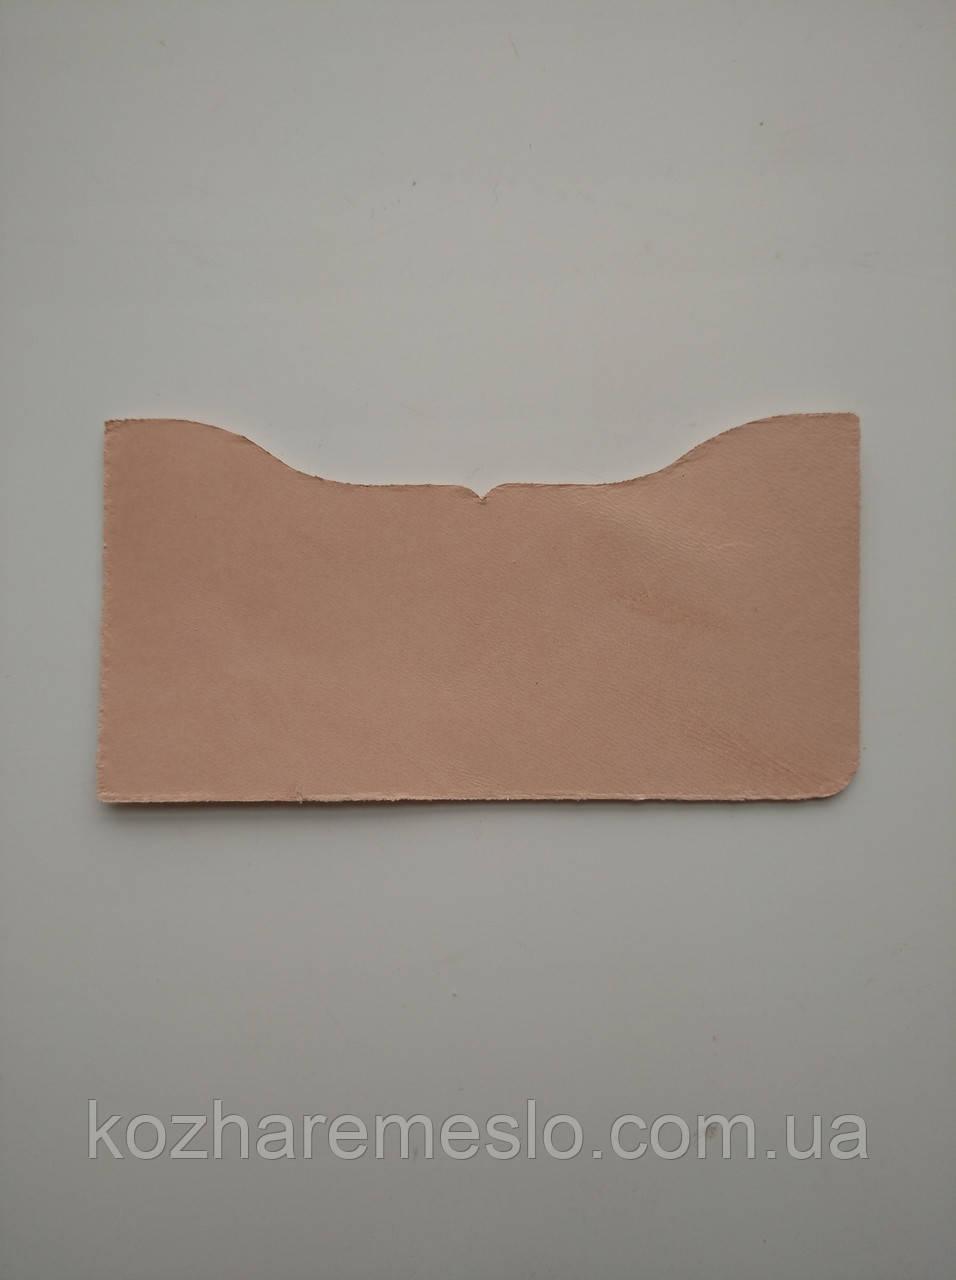 Карман(правый) под кредитную карту для кошелька (0.9 -1.1 мм)